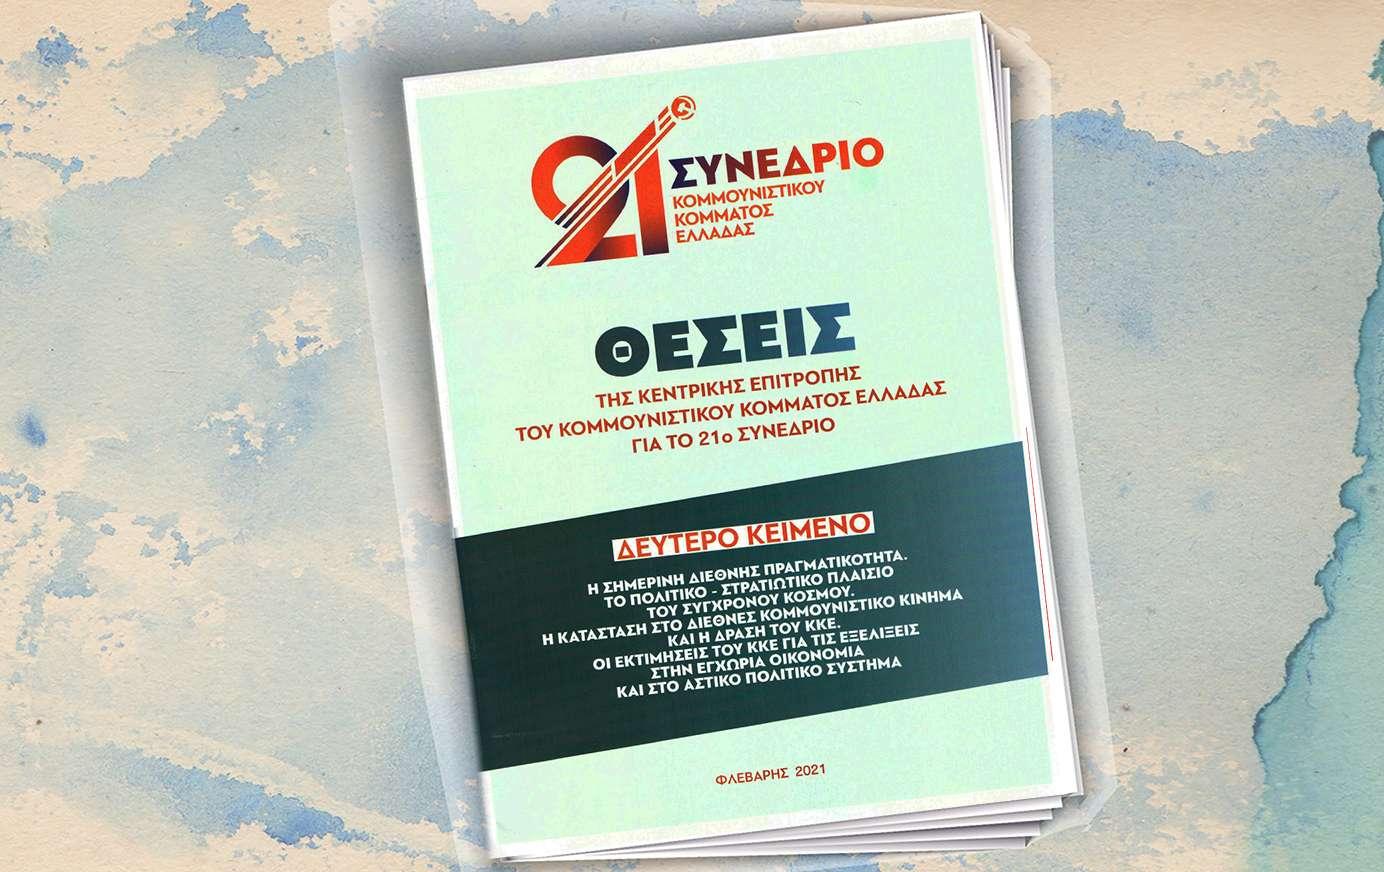 KKE ΚΚΕ 21 SYNEDRIO Συνέδριο theseis Θέσεις 2